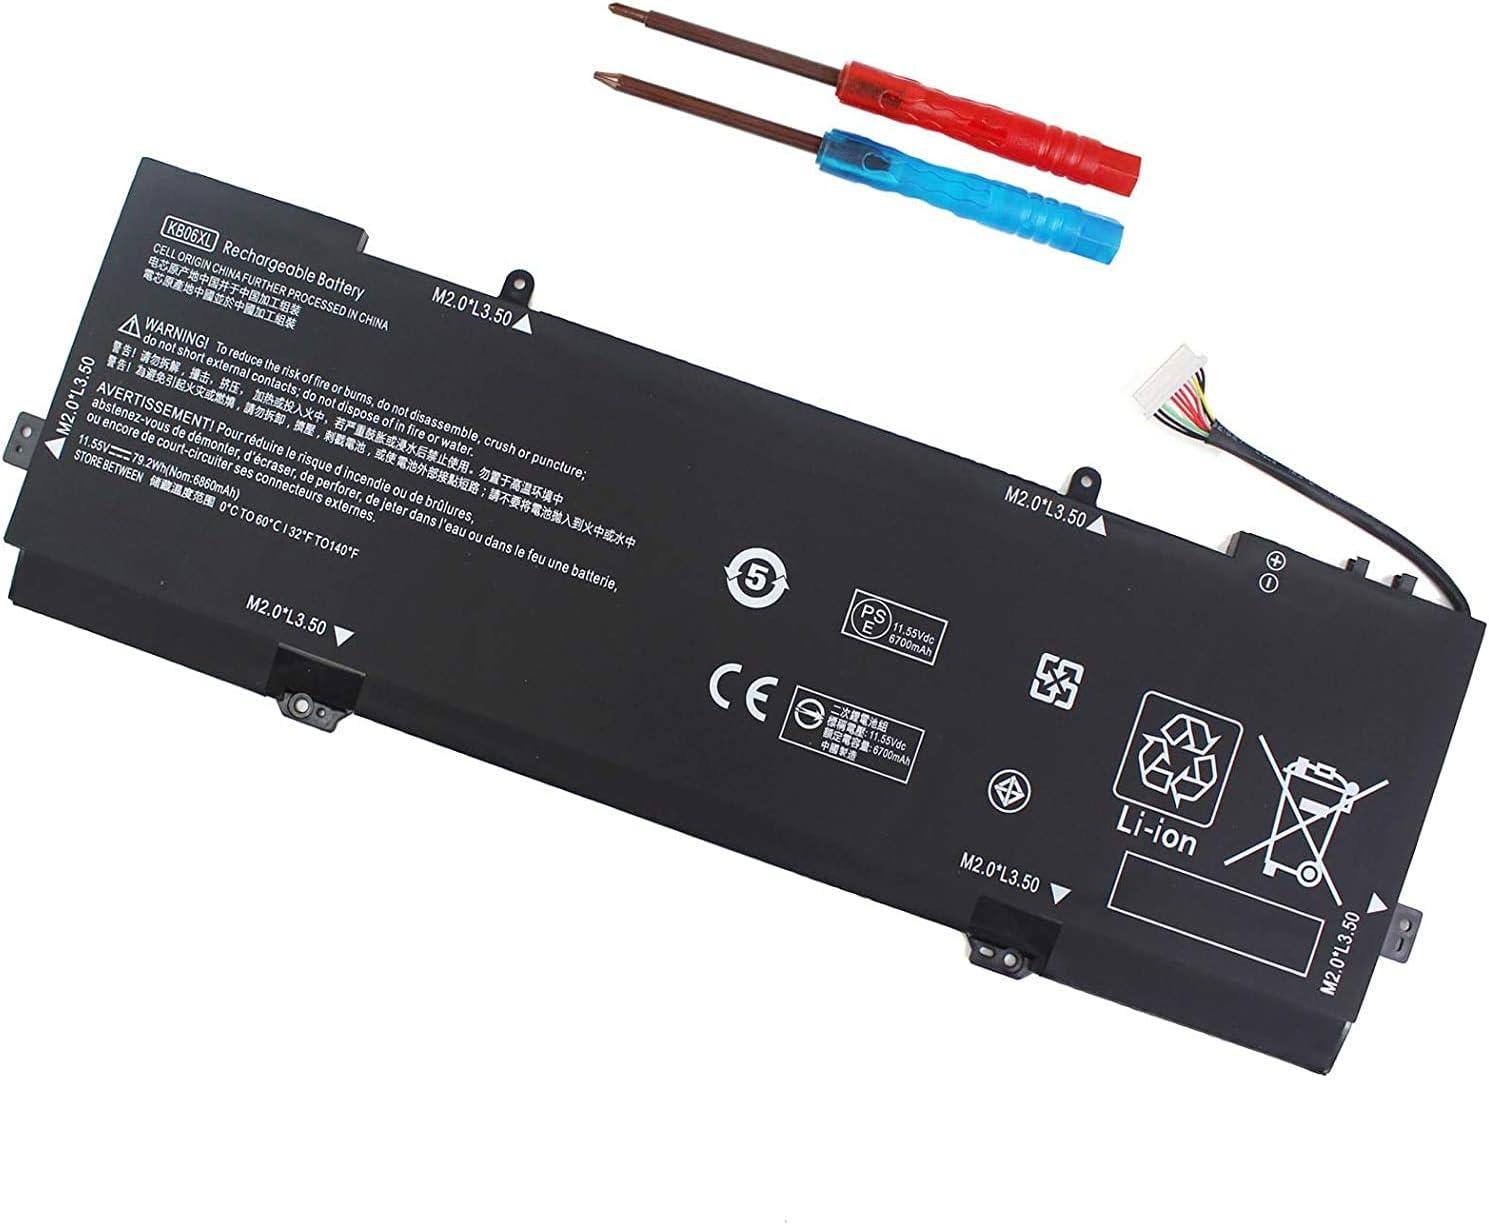 KB06XL Battery Compatible with HP Spectre X360 15-BL0XX 15-BL002XX 15-Bl012DX 15-BL075NR 15-BL030NG BL062NR 15T-Bl100 Z6L01EA Z4Z35UA Z4Z37UA 902499-855 902499-856 TPN-Q179 902401-2C1